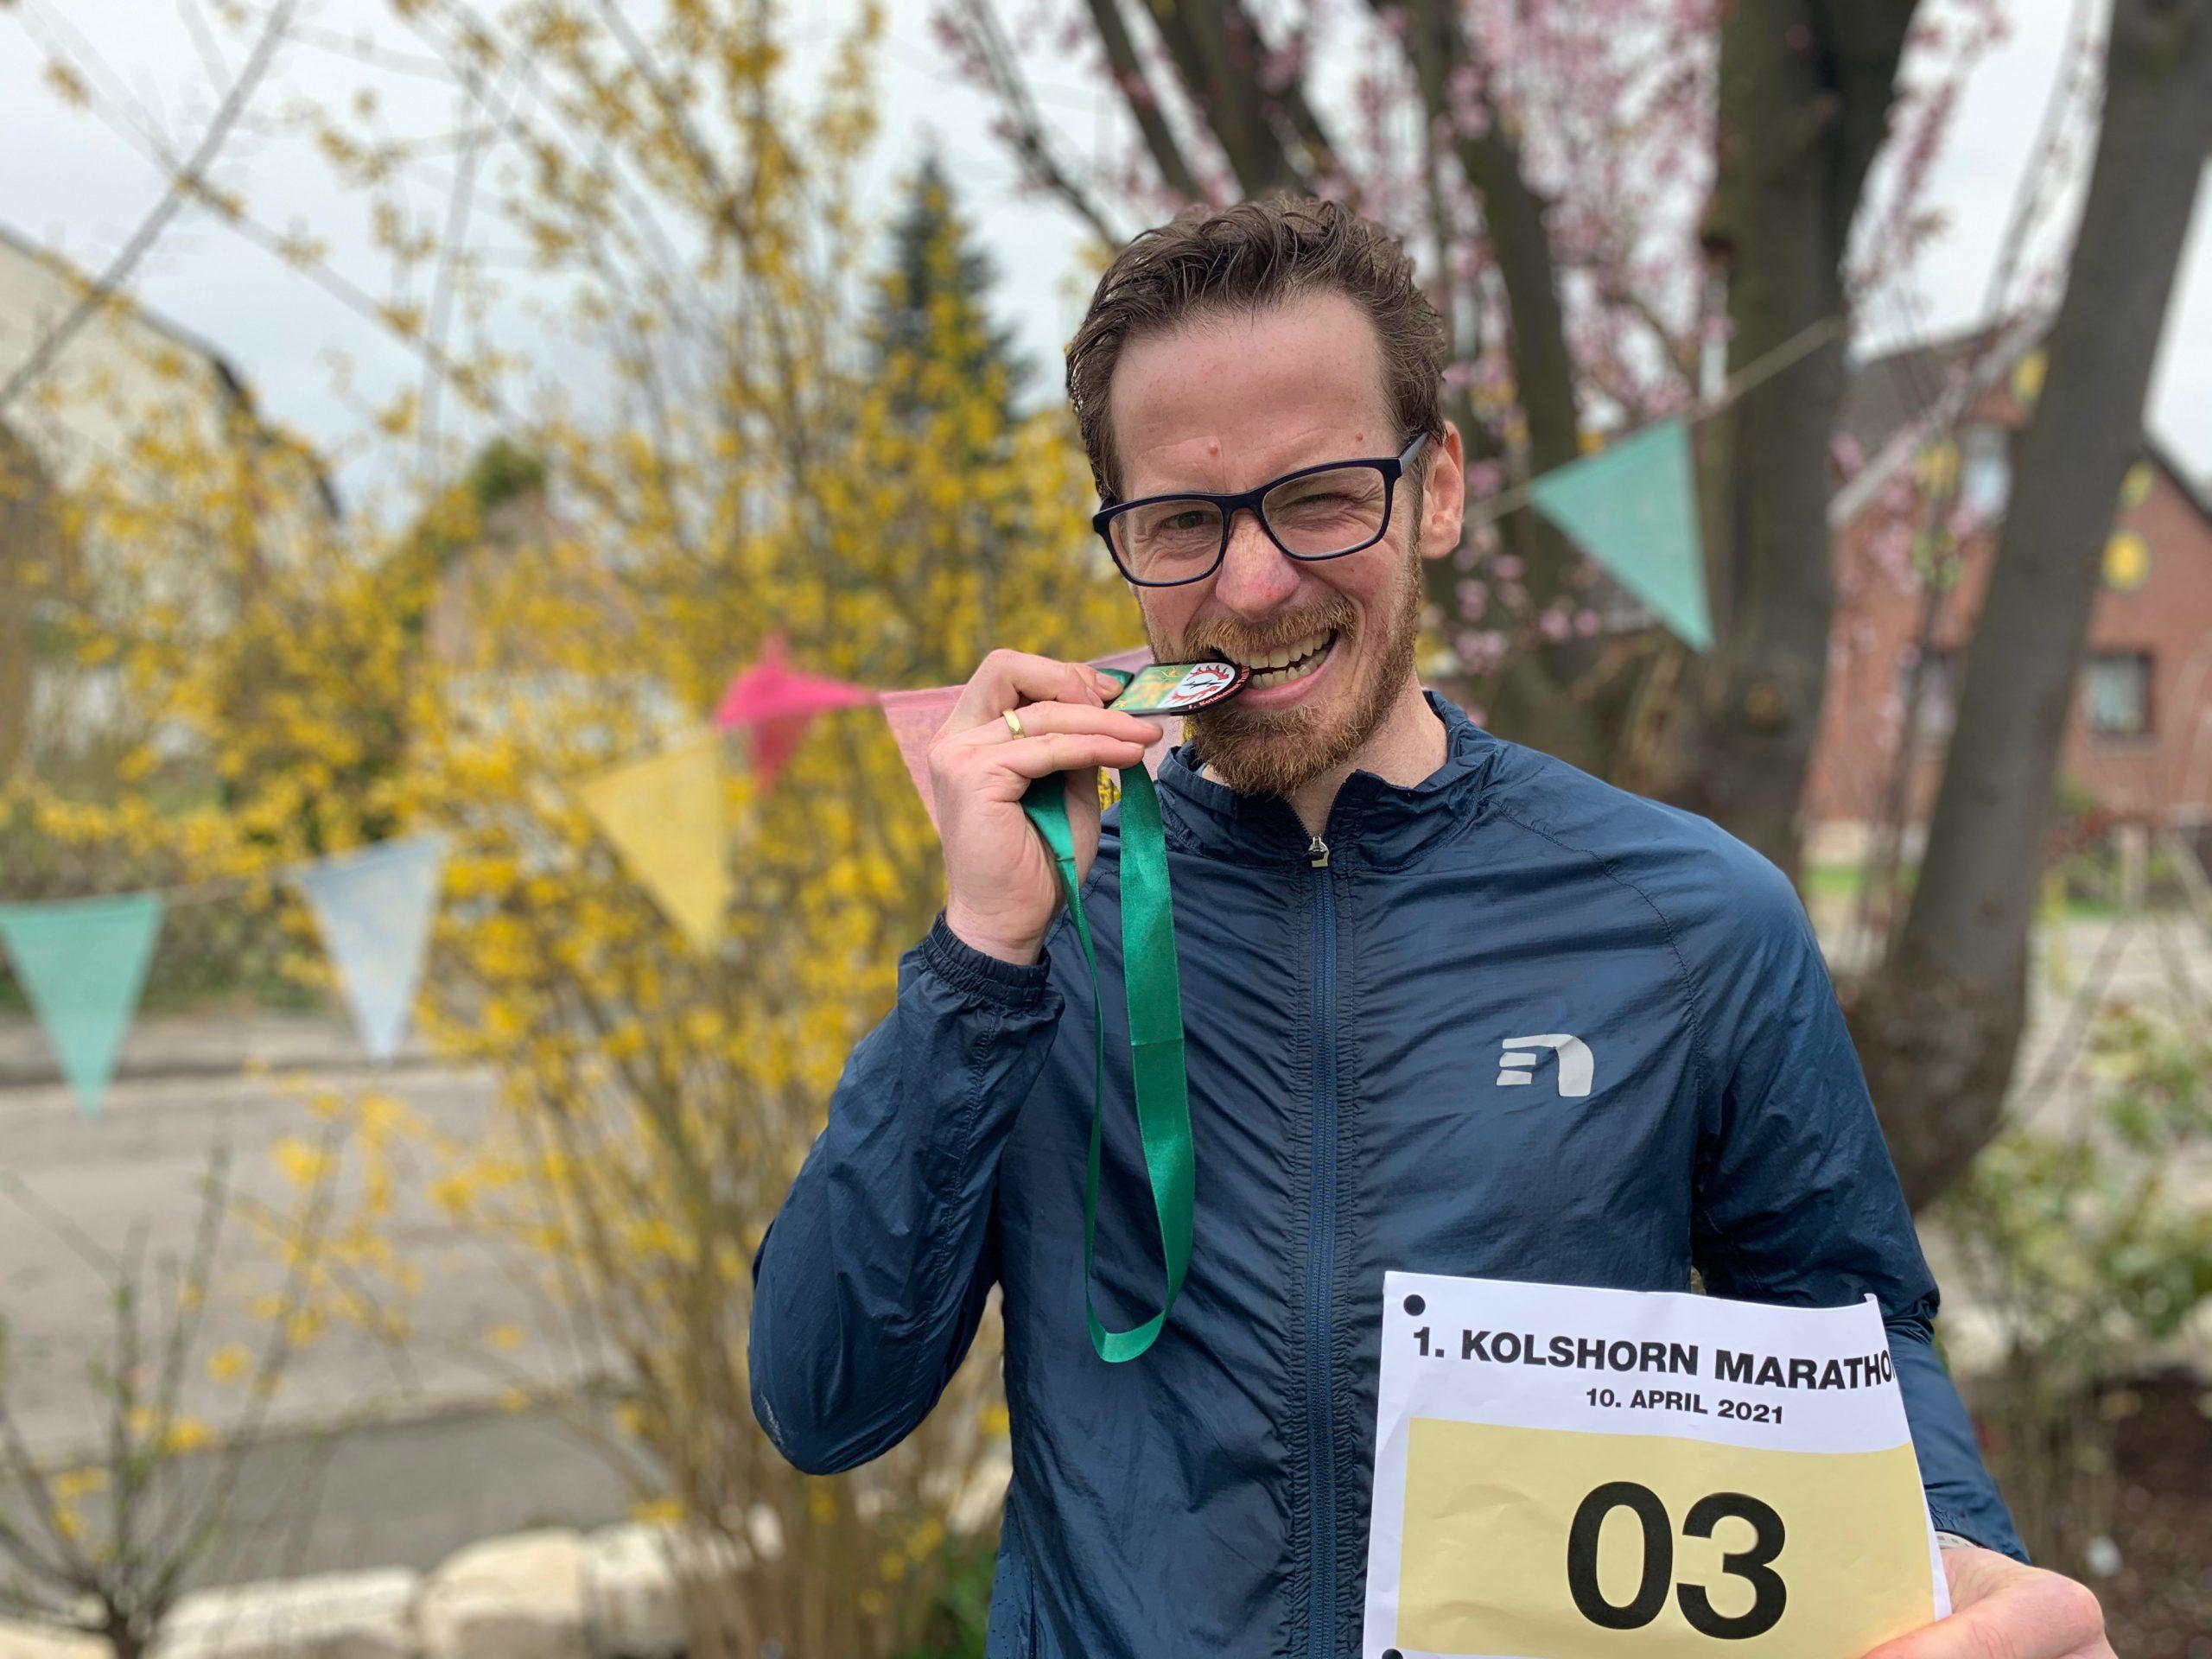 1. Kolshorner Trail Marathon